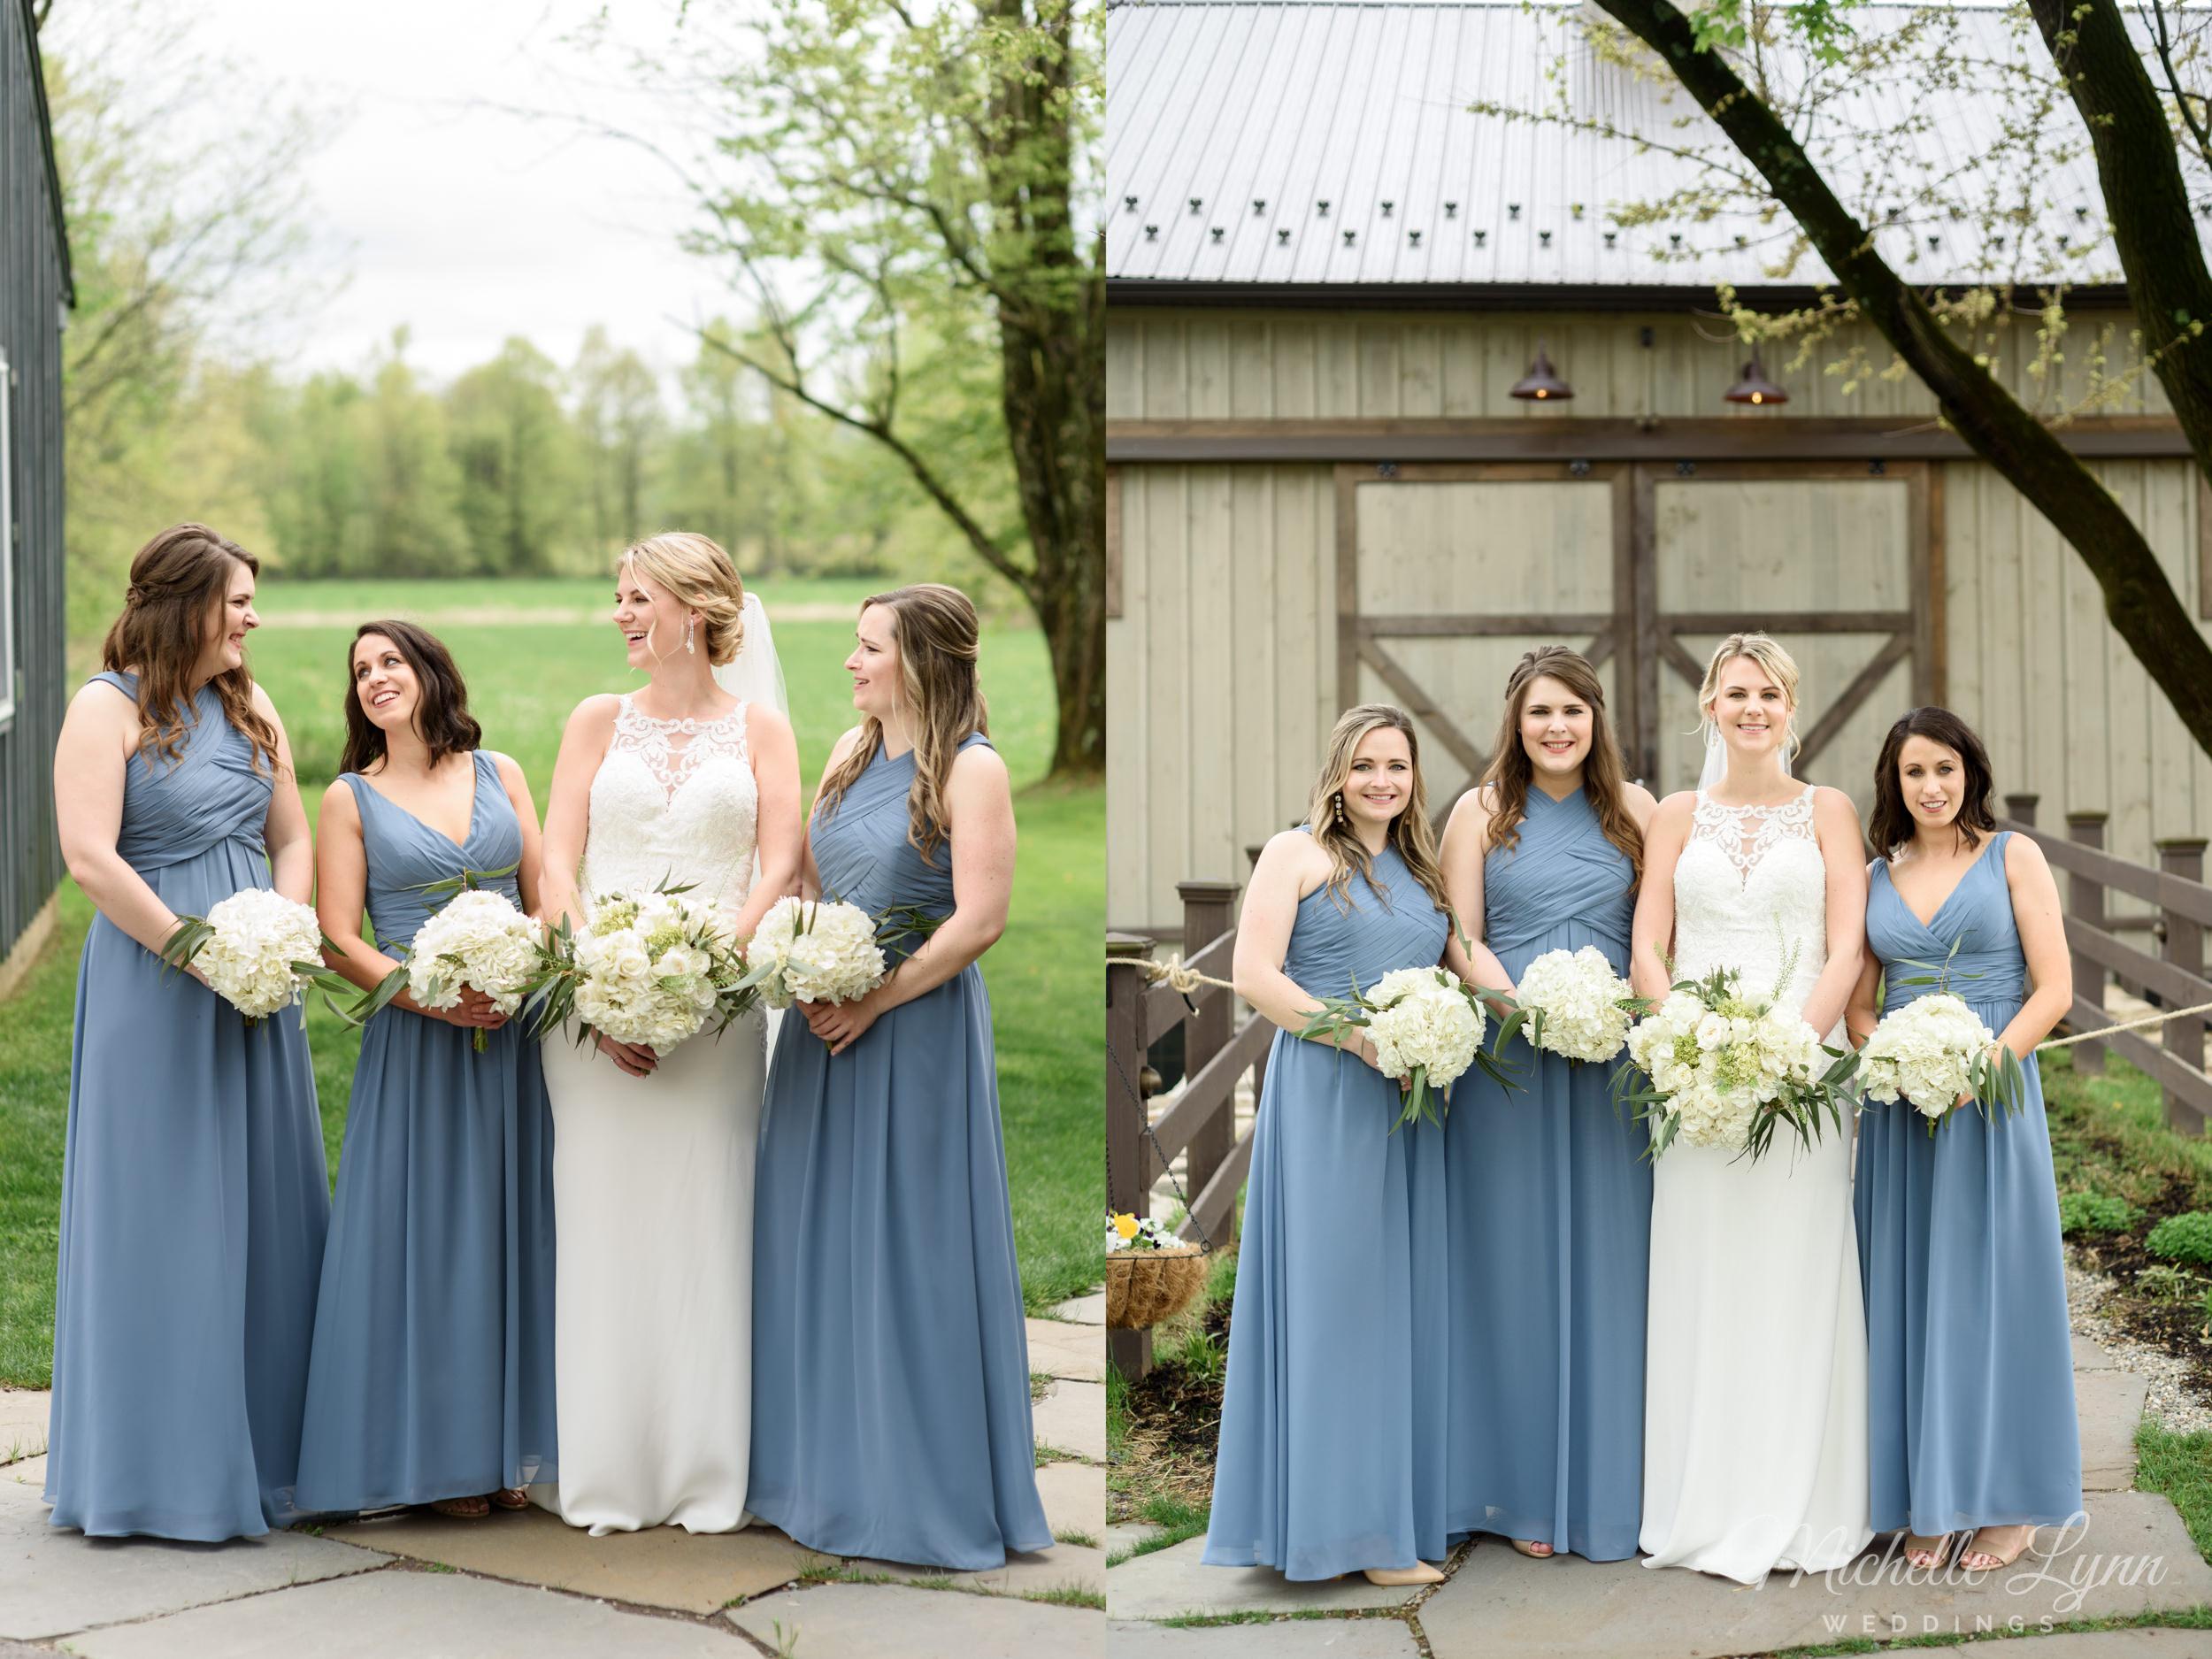 mlw-the-farm-bakery-and-events-wedding-photos-18.jpg